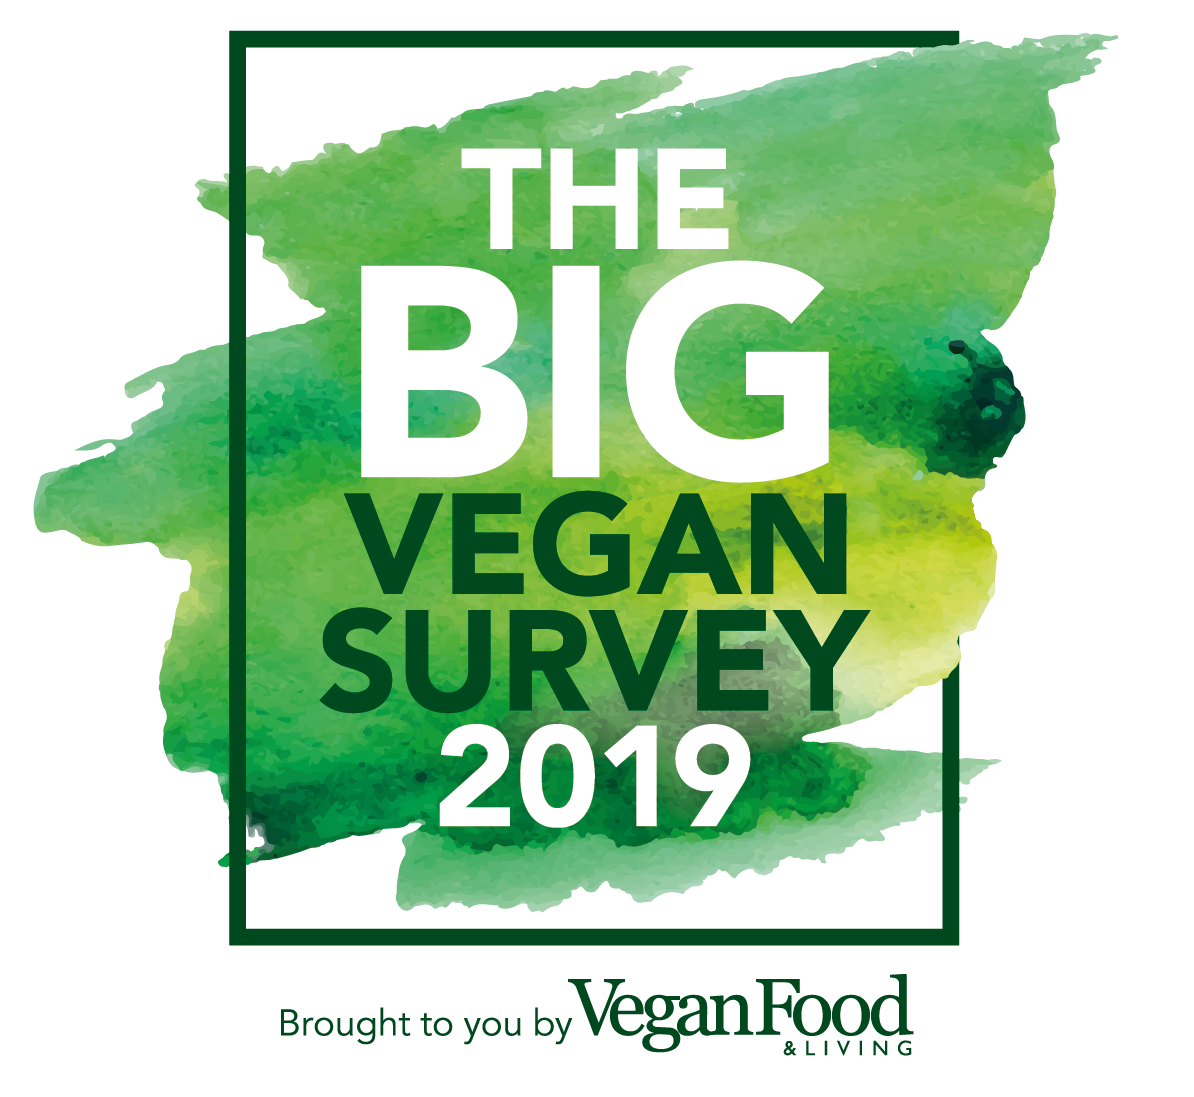 The Big Vegan Survey 2019